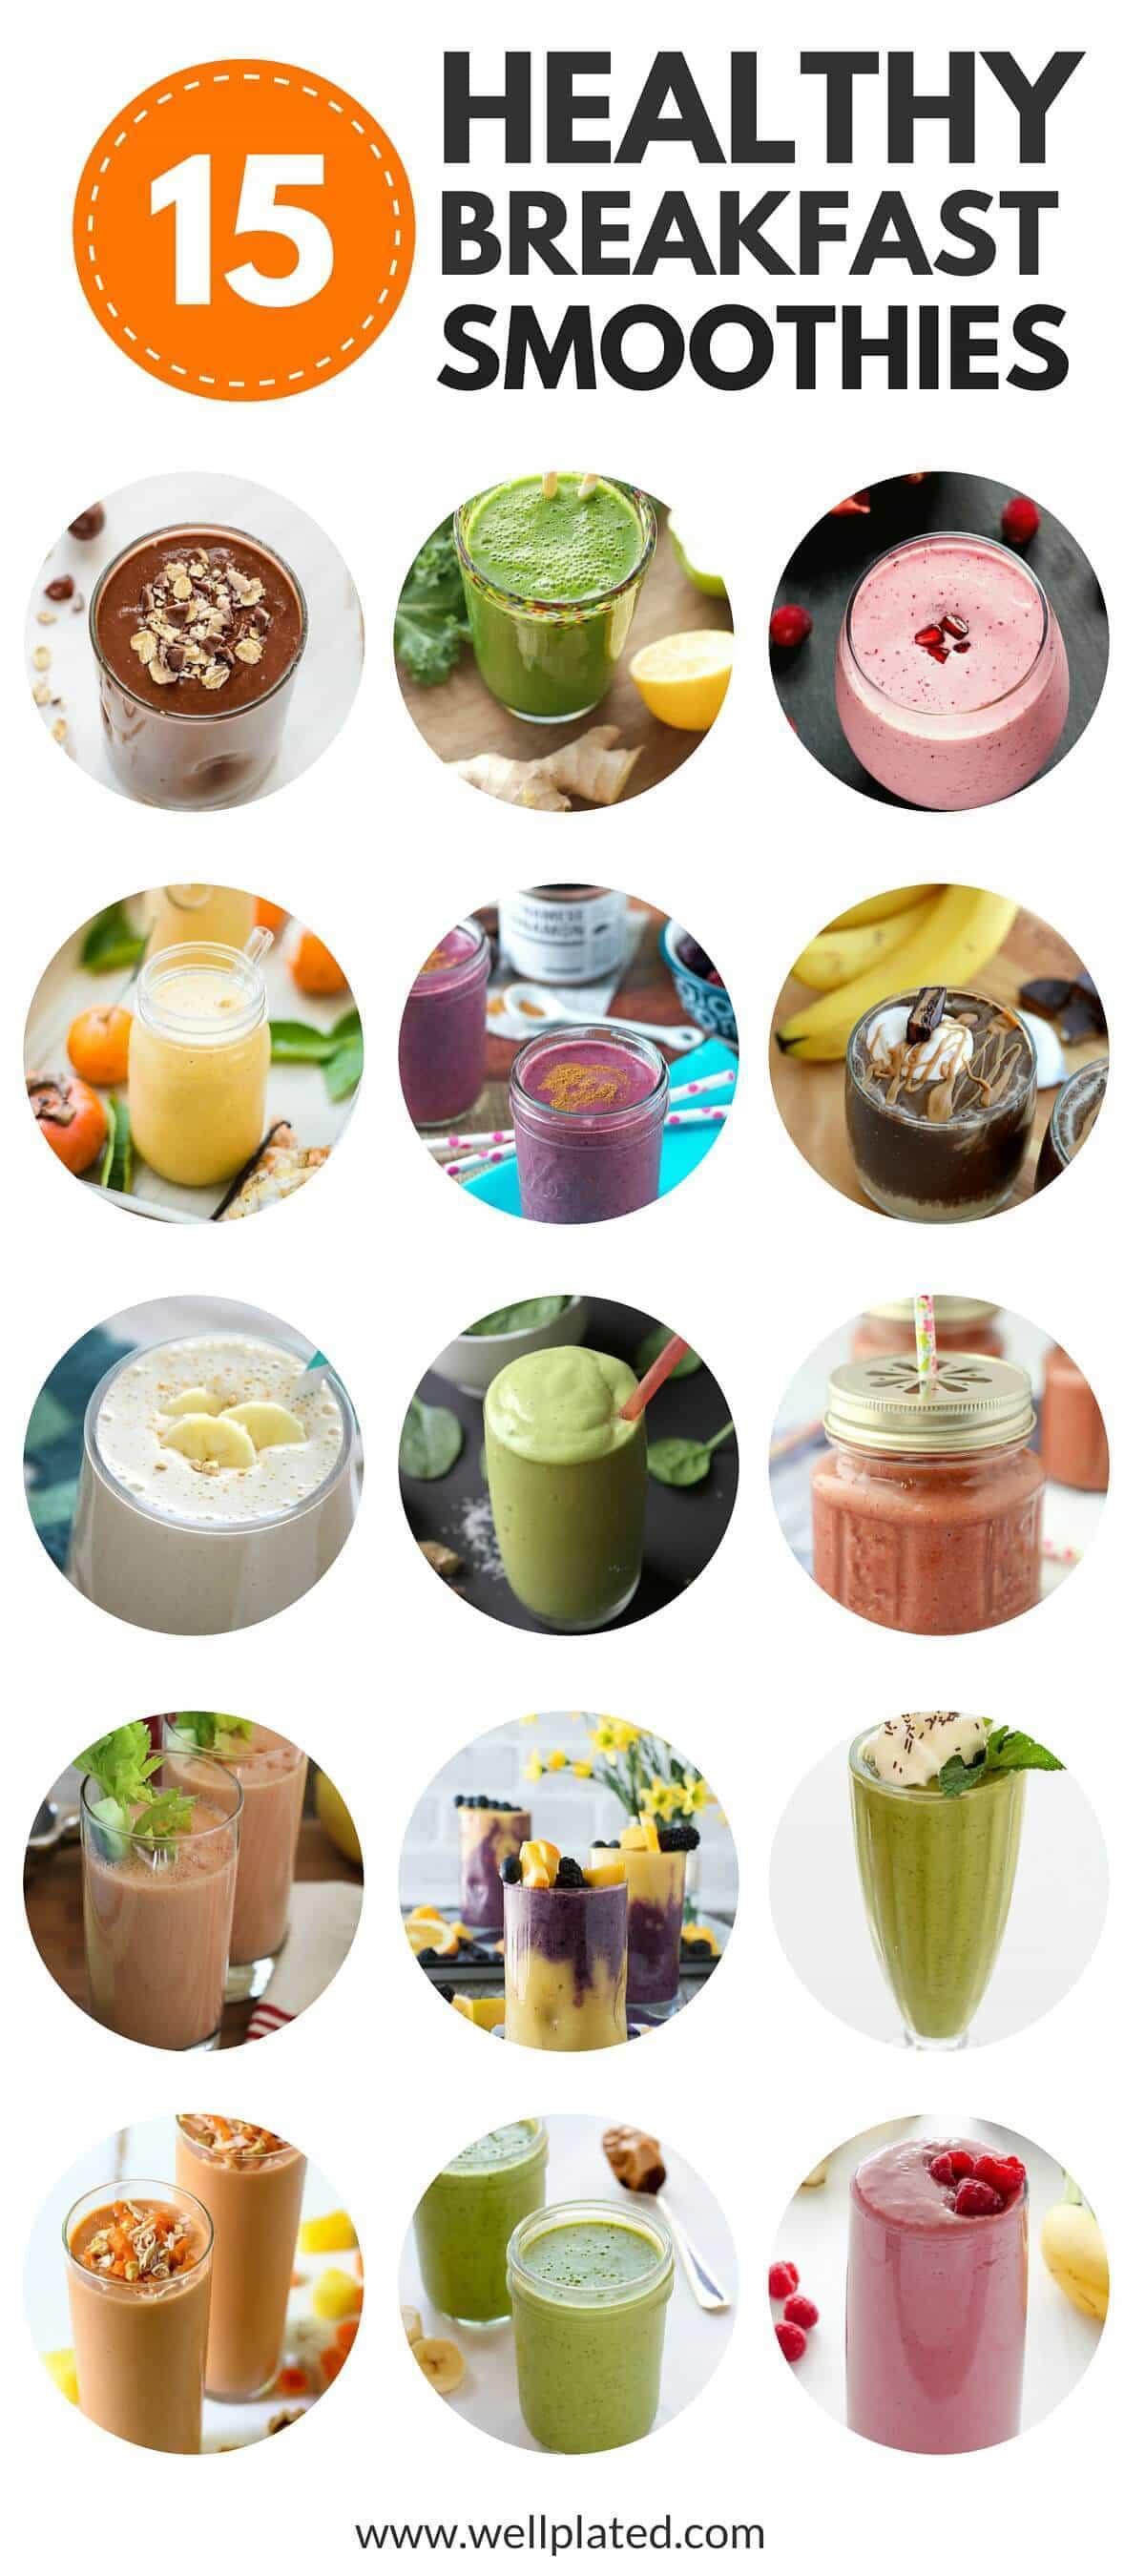 Healthy Breakfast Desserts  The Best 15 Healthy Breakfast Smoothies